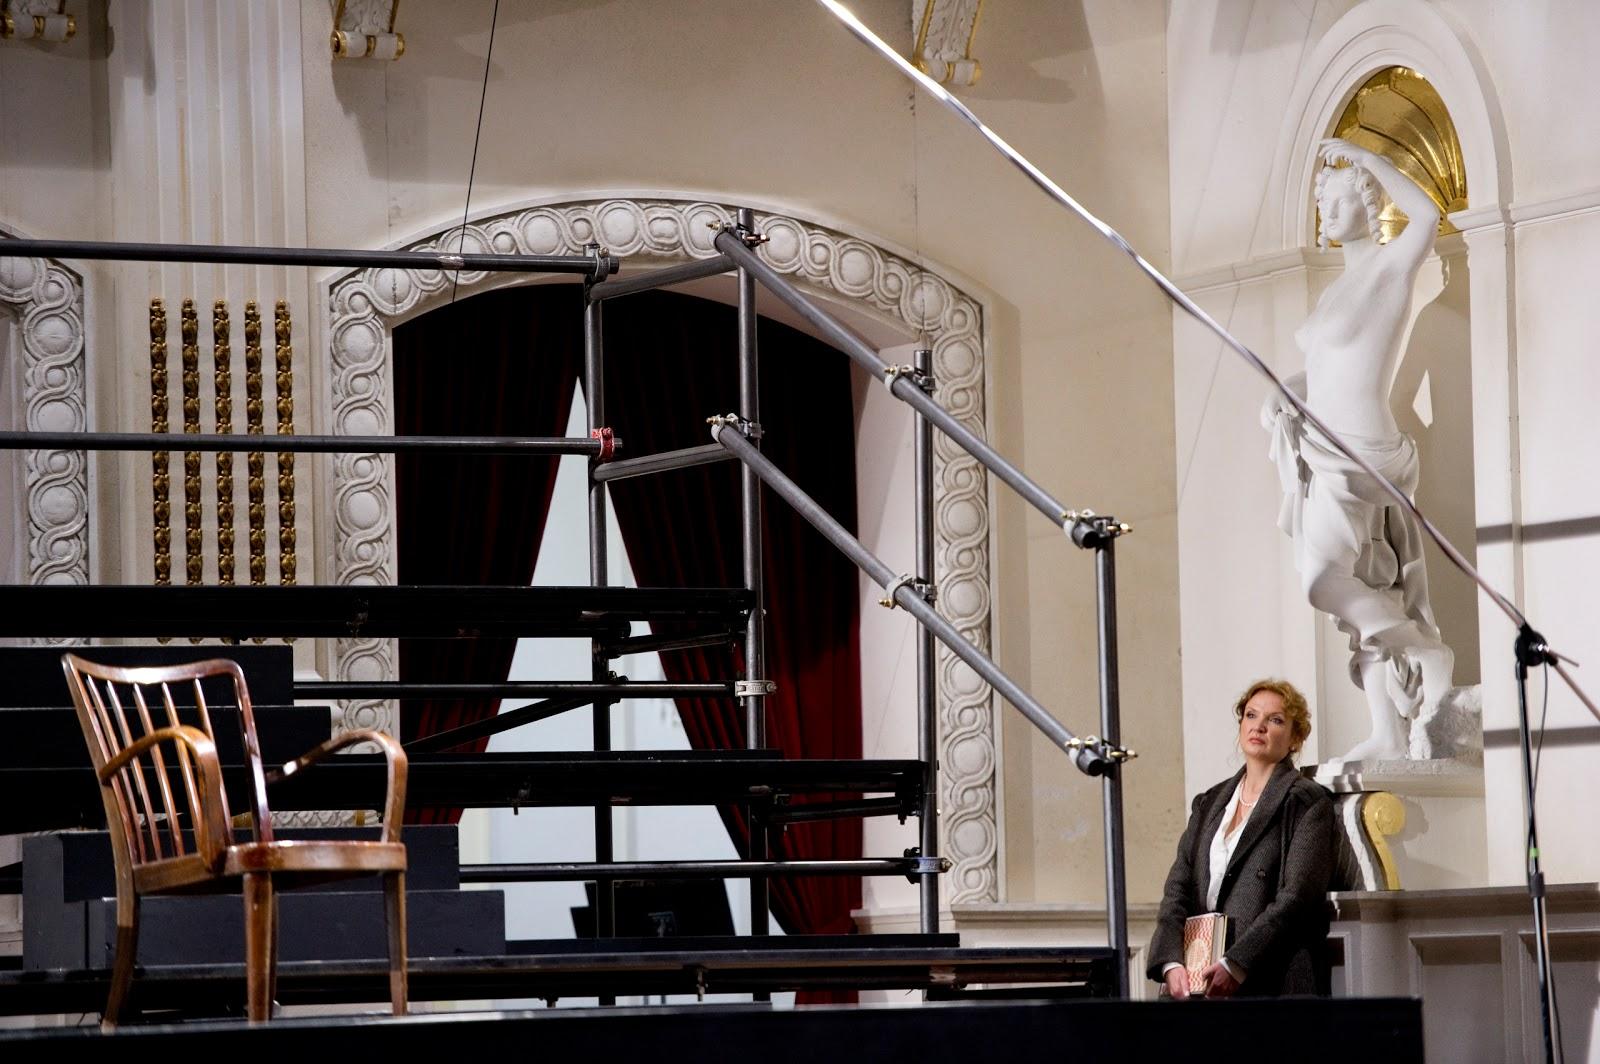 Image: Salzburg Festival/Monika Rittershaus